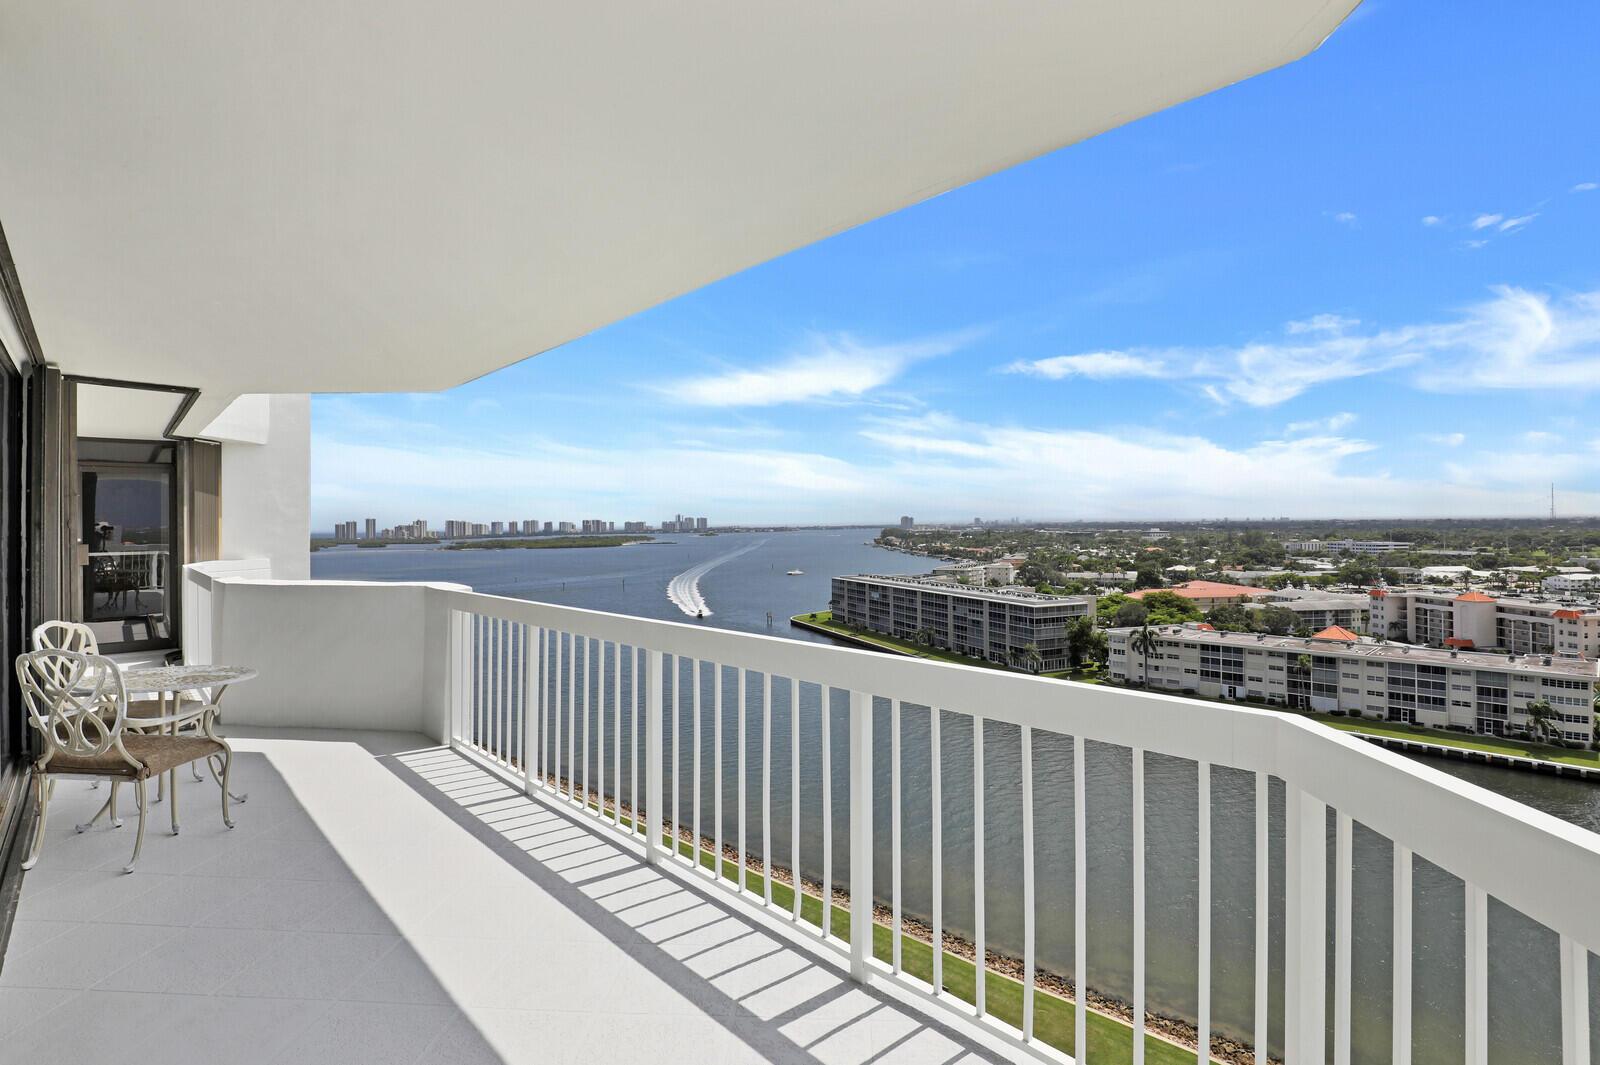 123 Lakeshore Unit 1544, North Palm Beach, Florida 33408